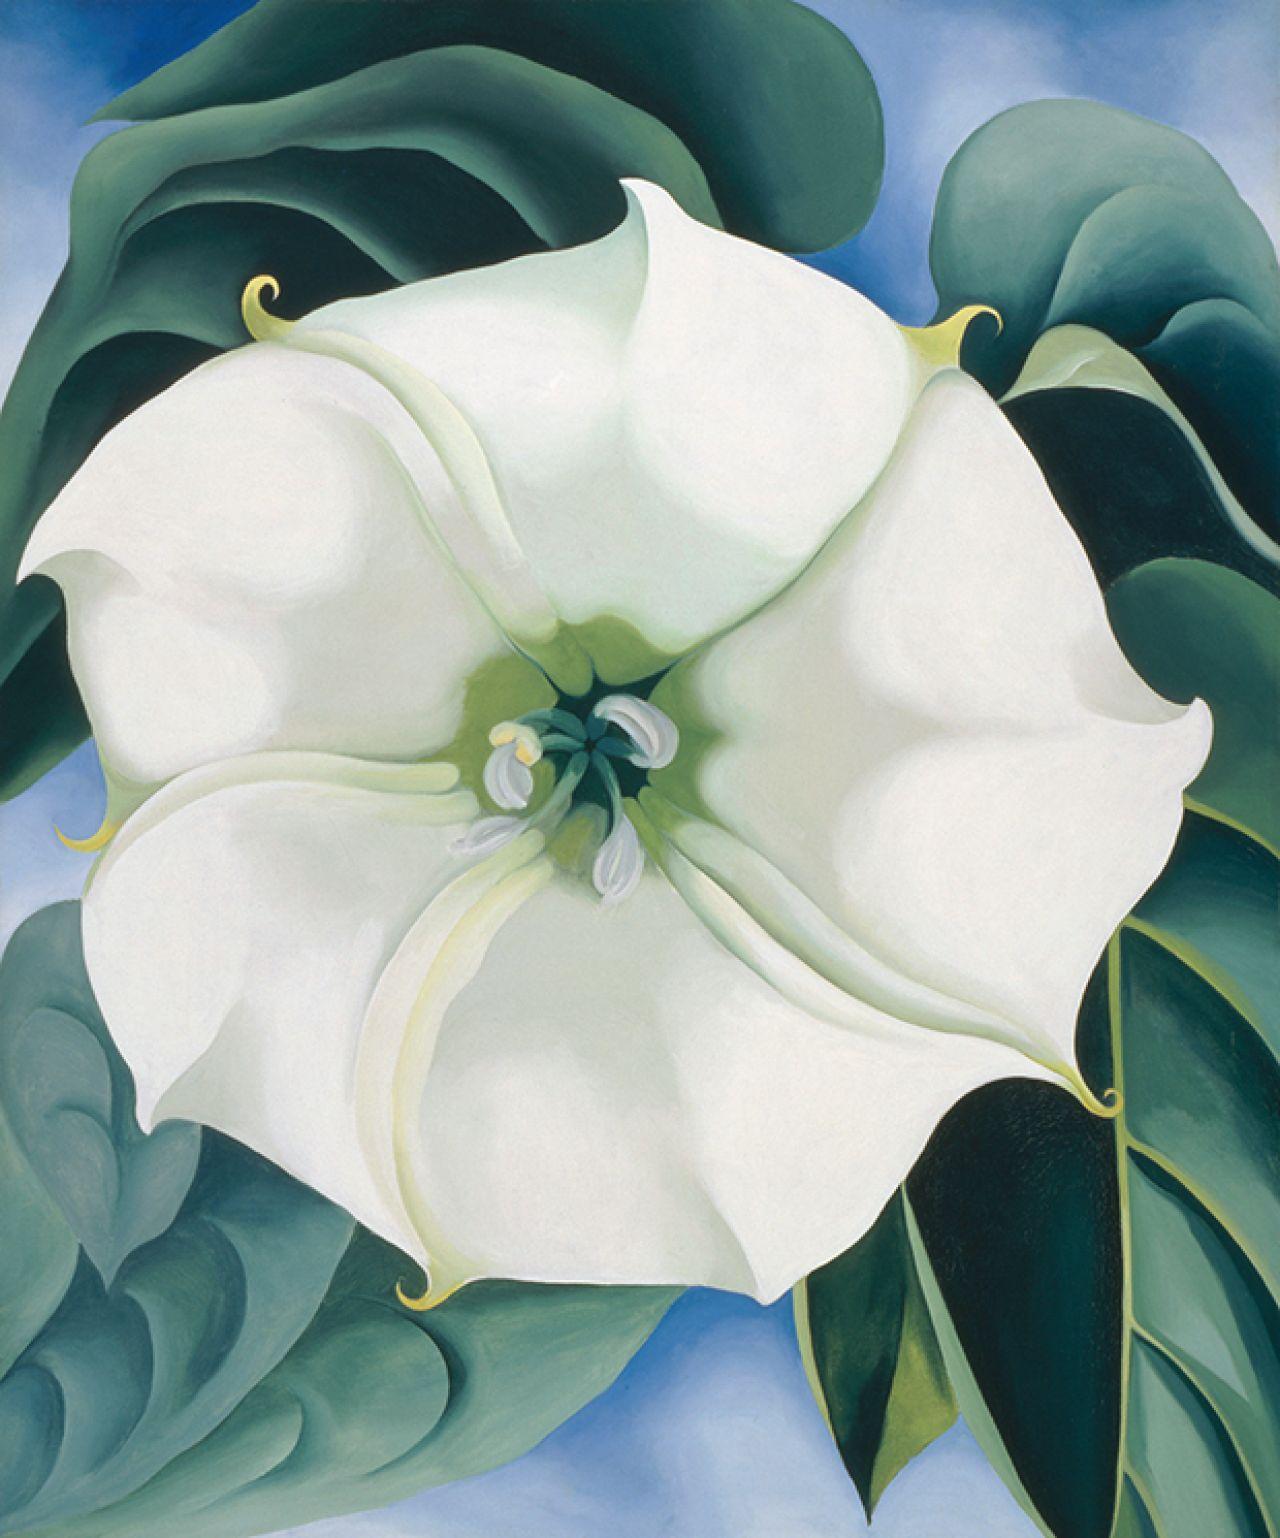 Georgia O'Keefe 'Jimson Weed/WhiteFlower No. 1'